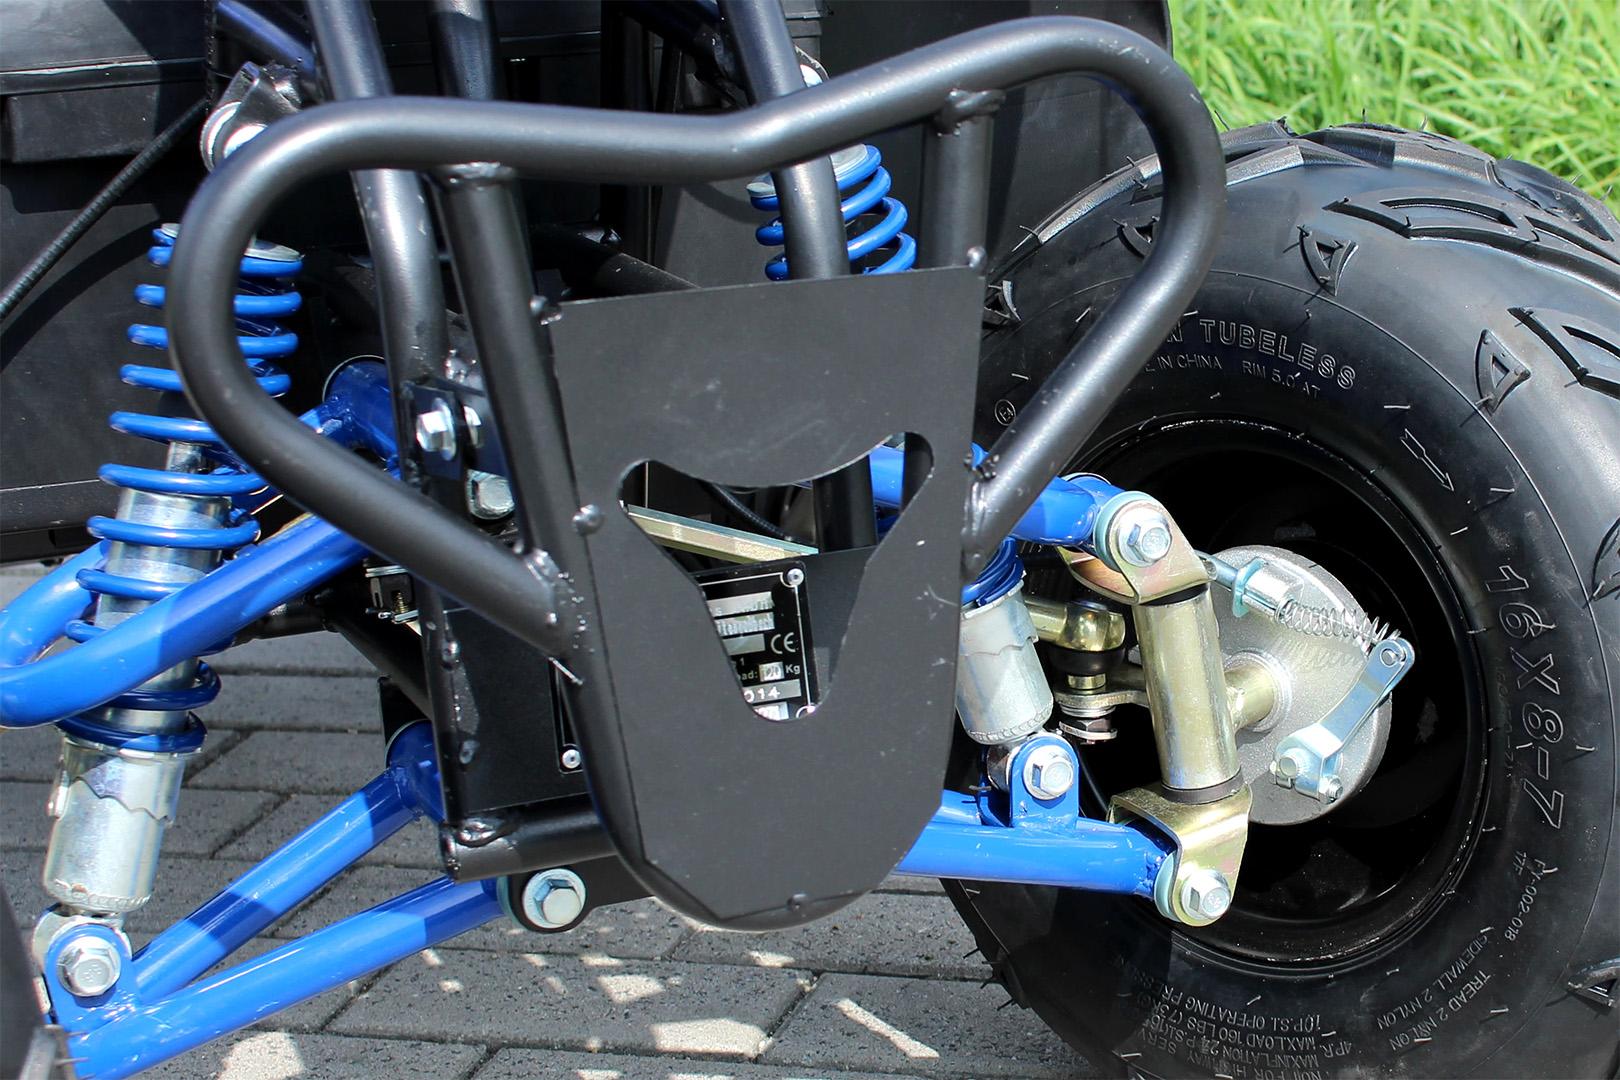 6f6fcb4c9e ... Vorschau: Actionbikes S-5-Elektro blau 33353135303131 10-Bremsen-Vorne  OL ...